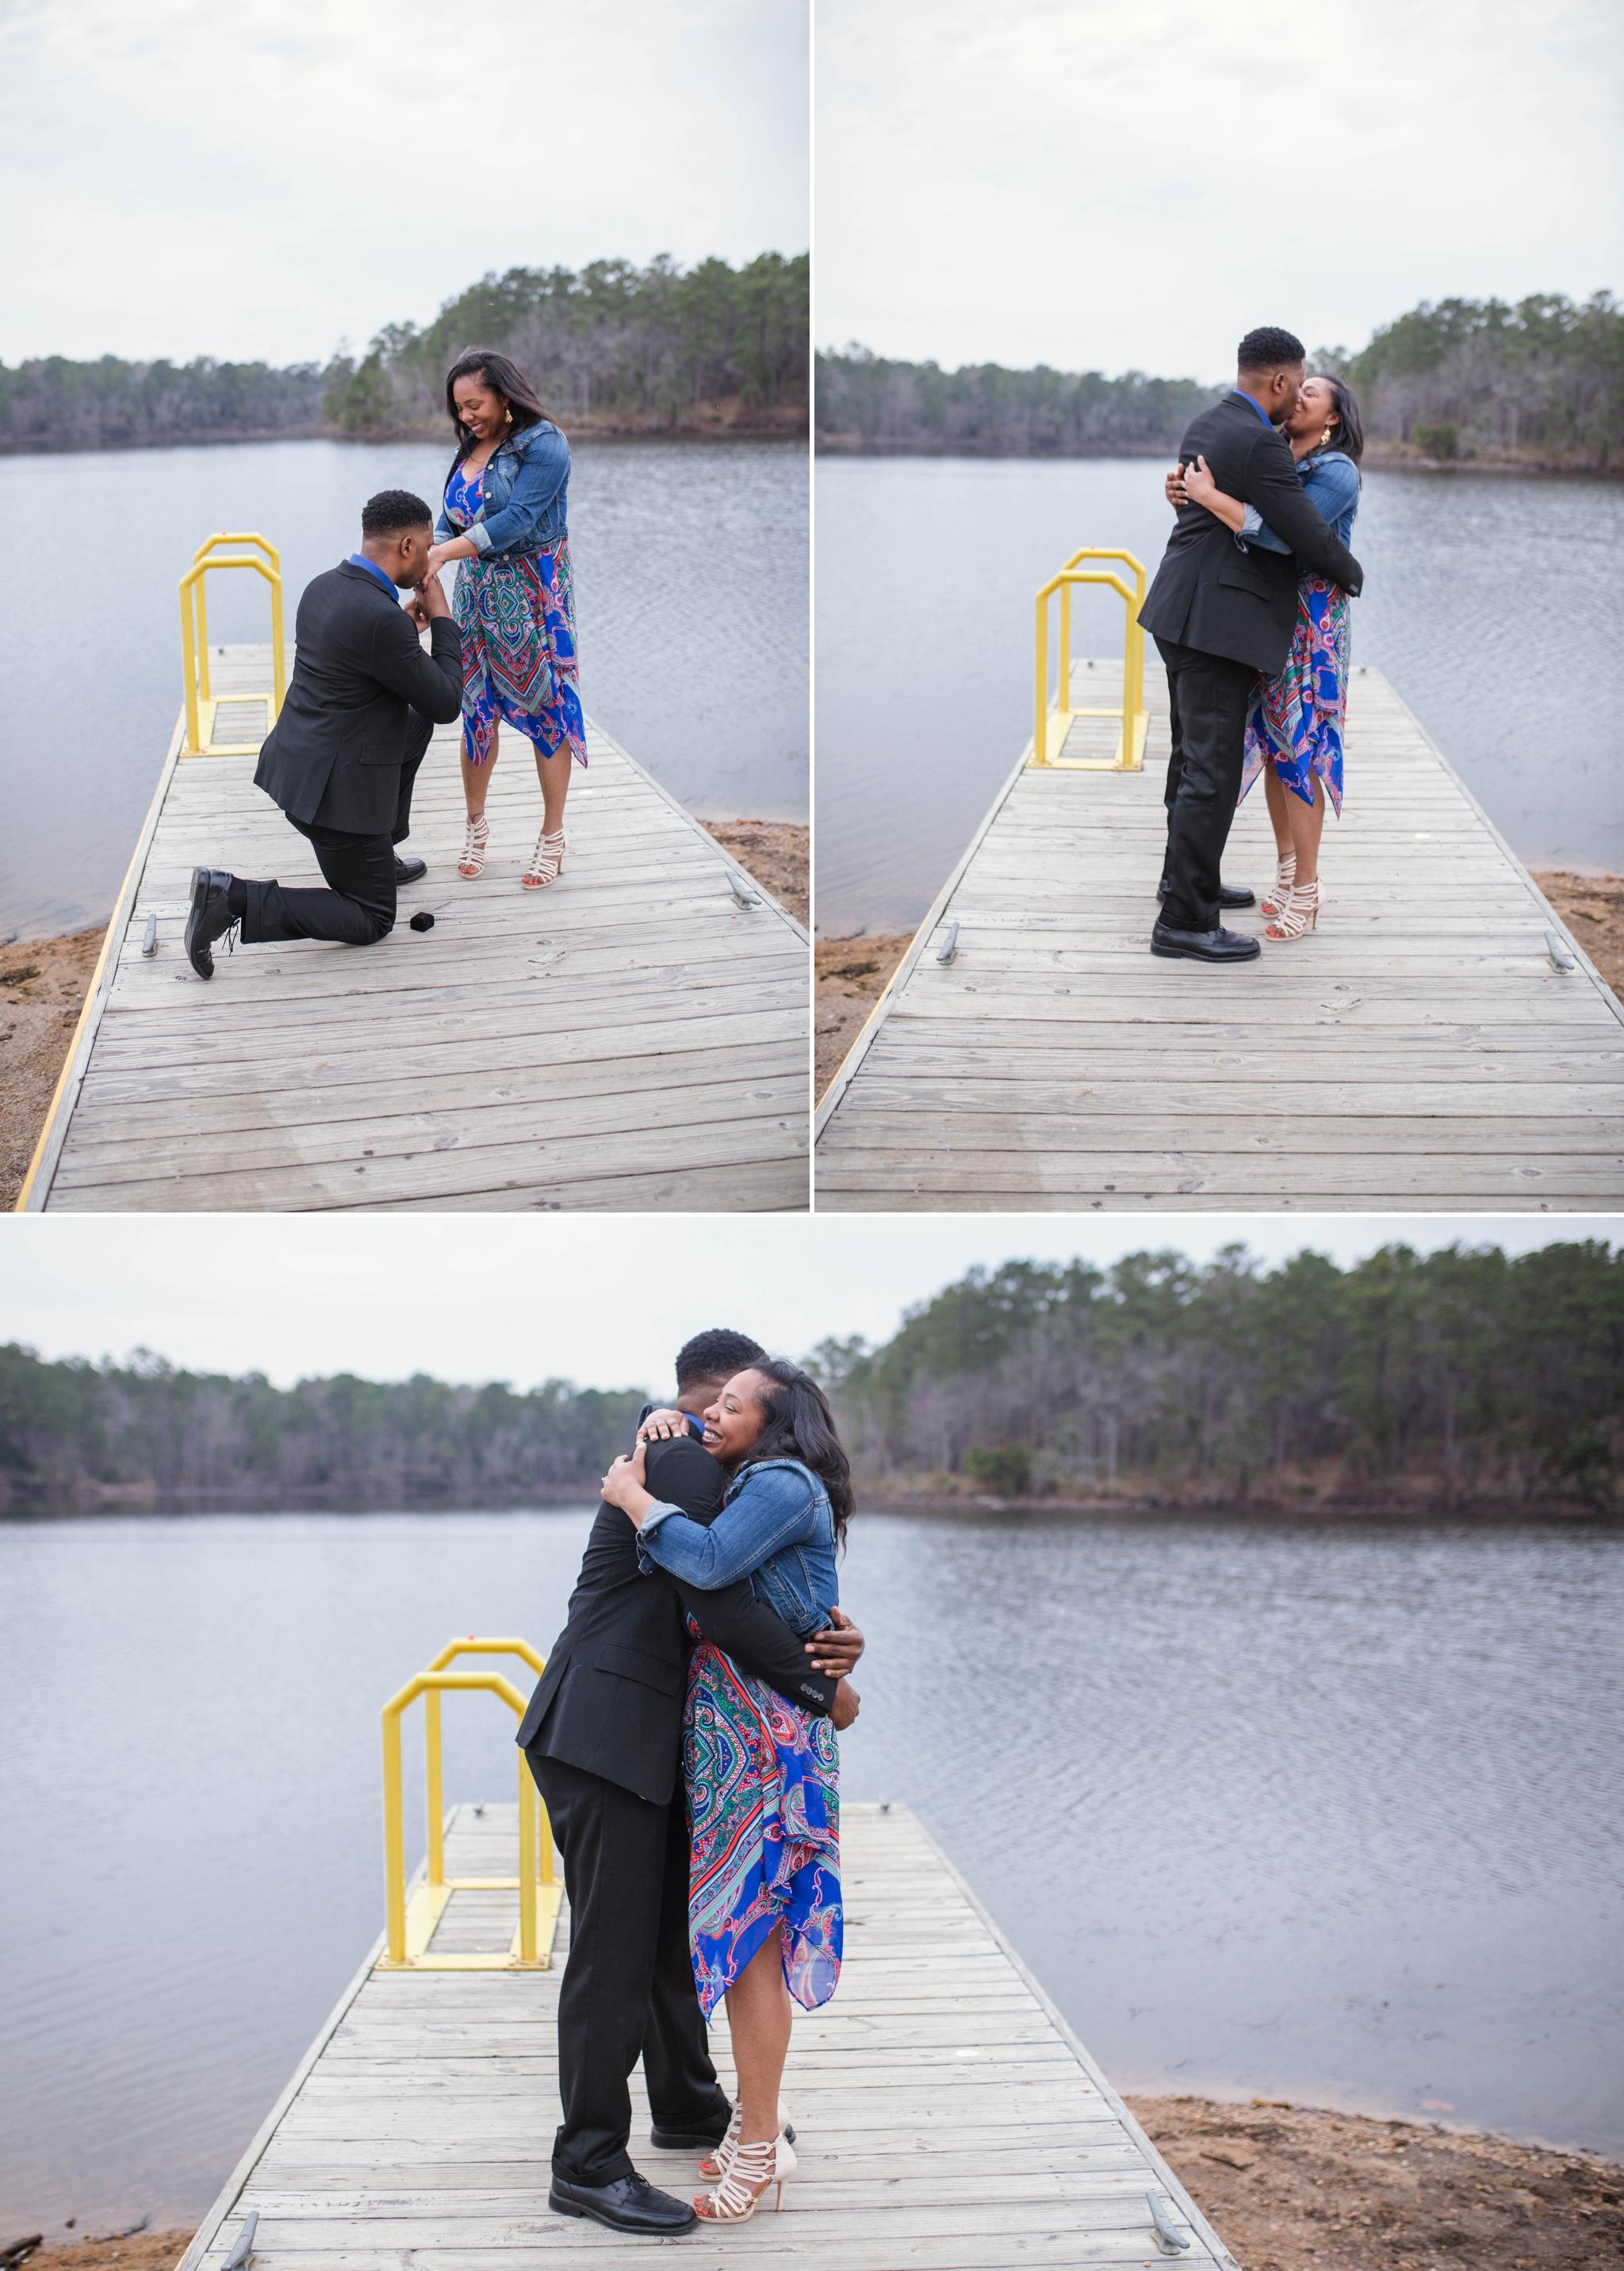 Surprise Proposal at Lake Rim - Fayetteville North Carolina Engagement Photographer